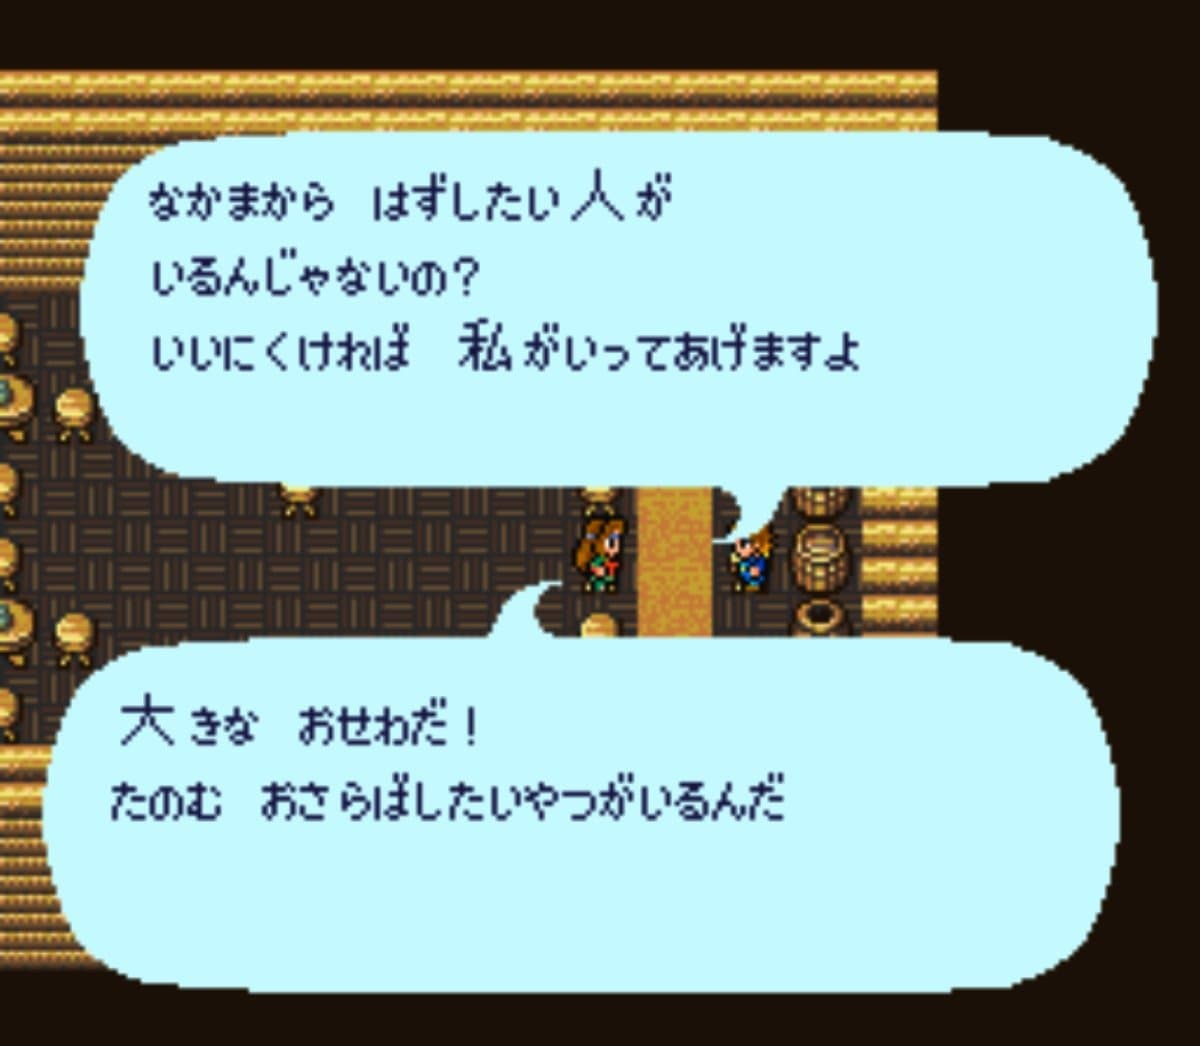 BGMも神!だが多くの絶望プレイヤーを生んだ激ムズRPG『ロマンシング・サガ』【ヤマグチクエスト・コラム】の画像006